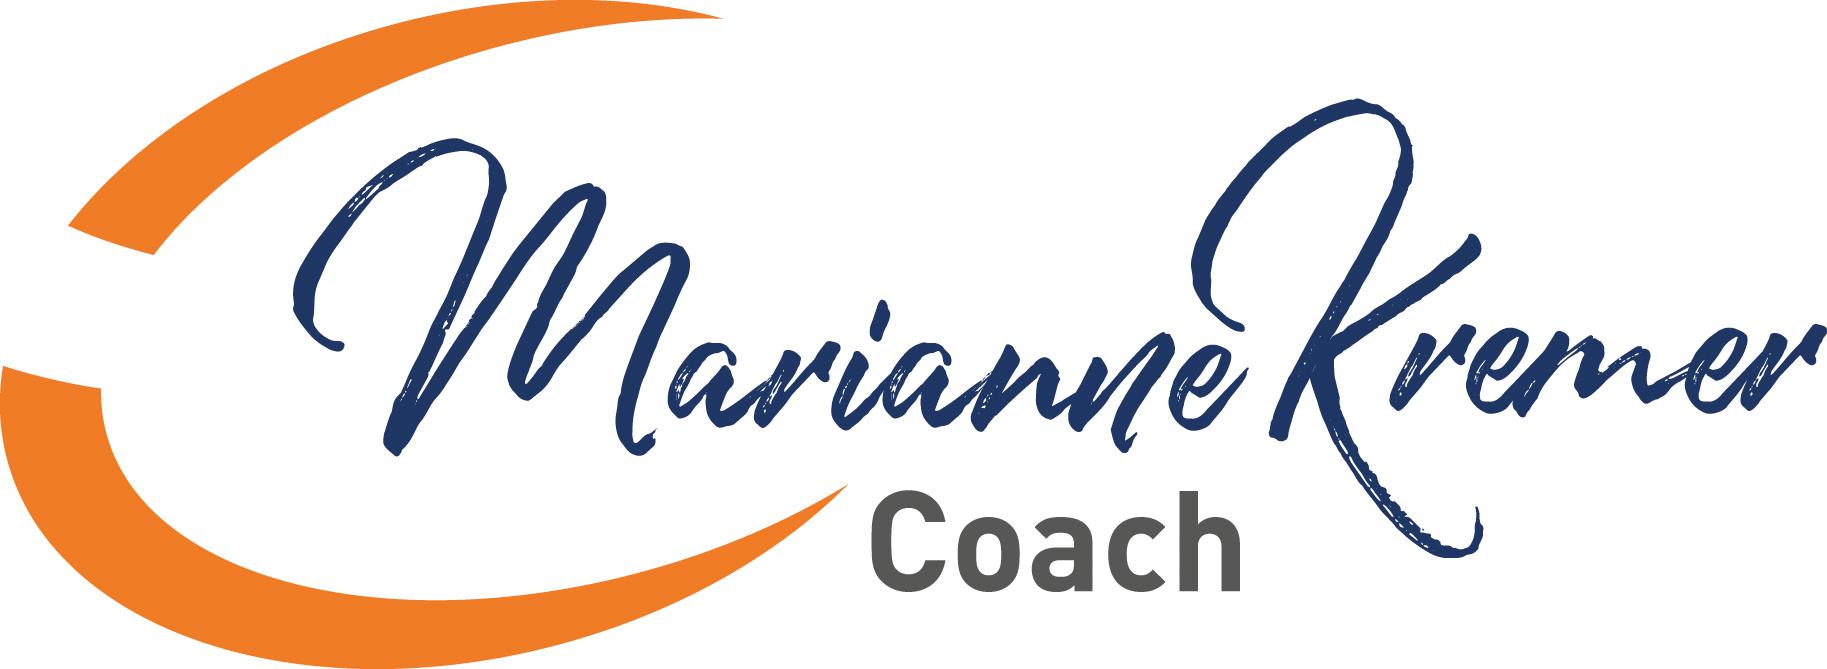 Marianne Kremer Coach